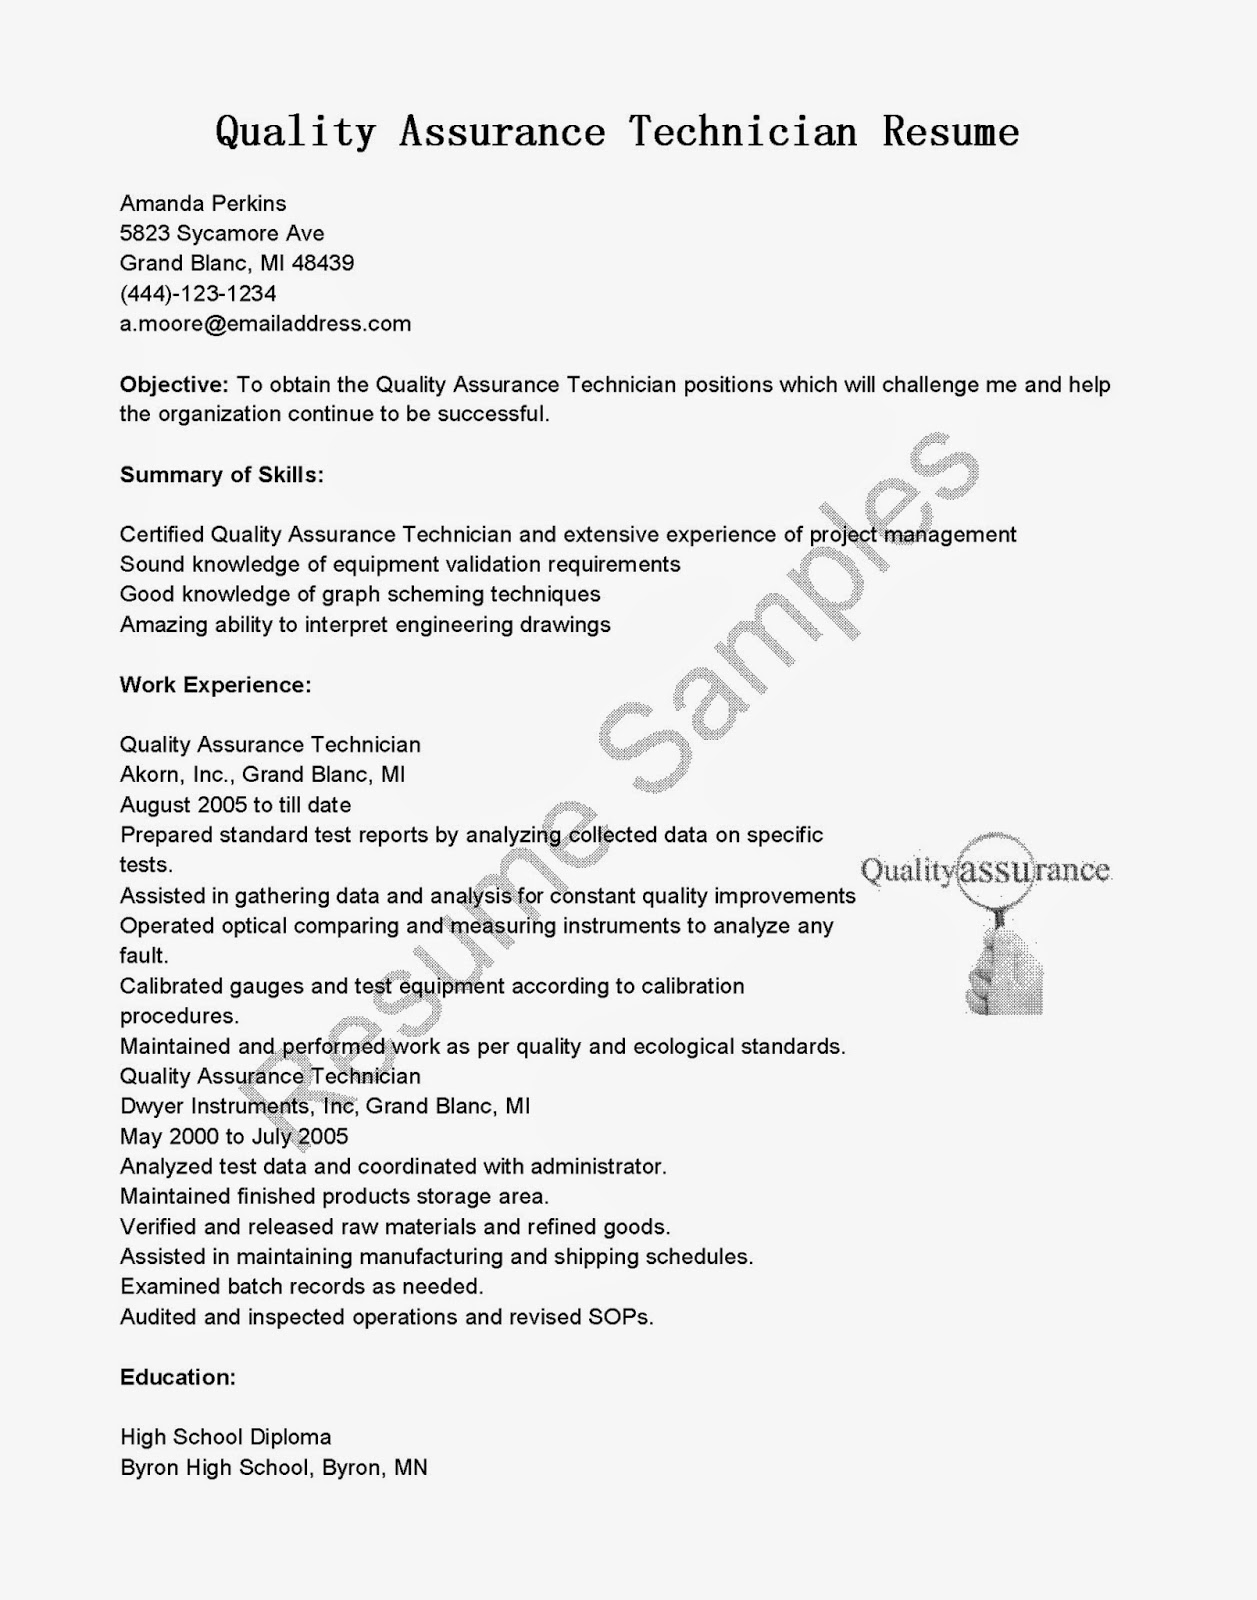 Resume Samples Quality Assurance Technician Resume Sample